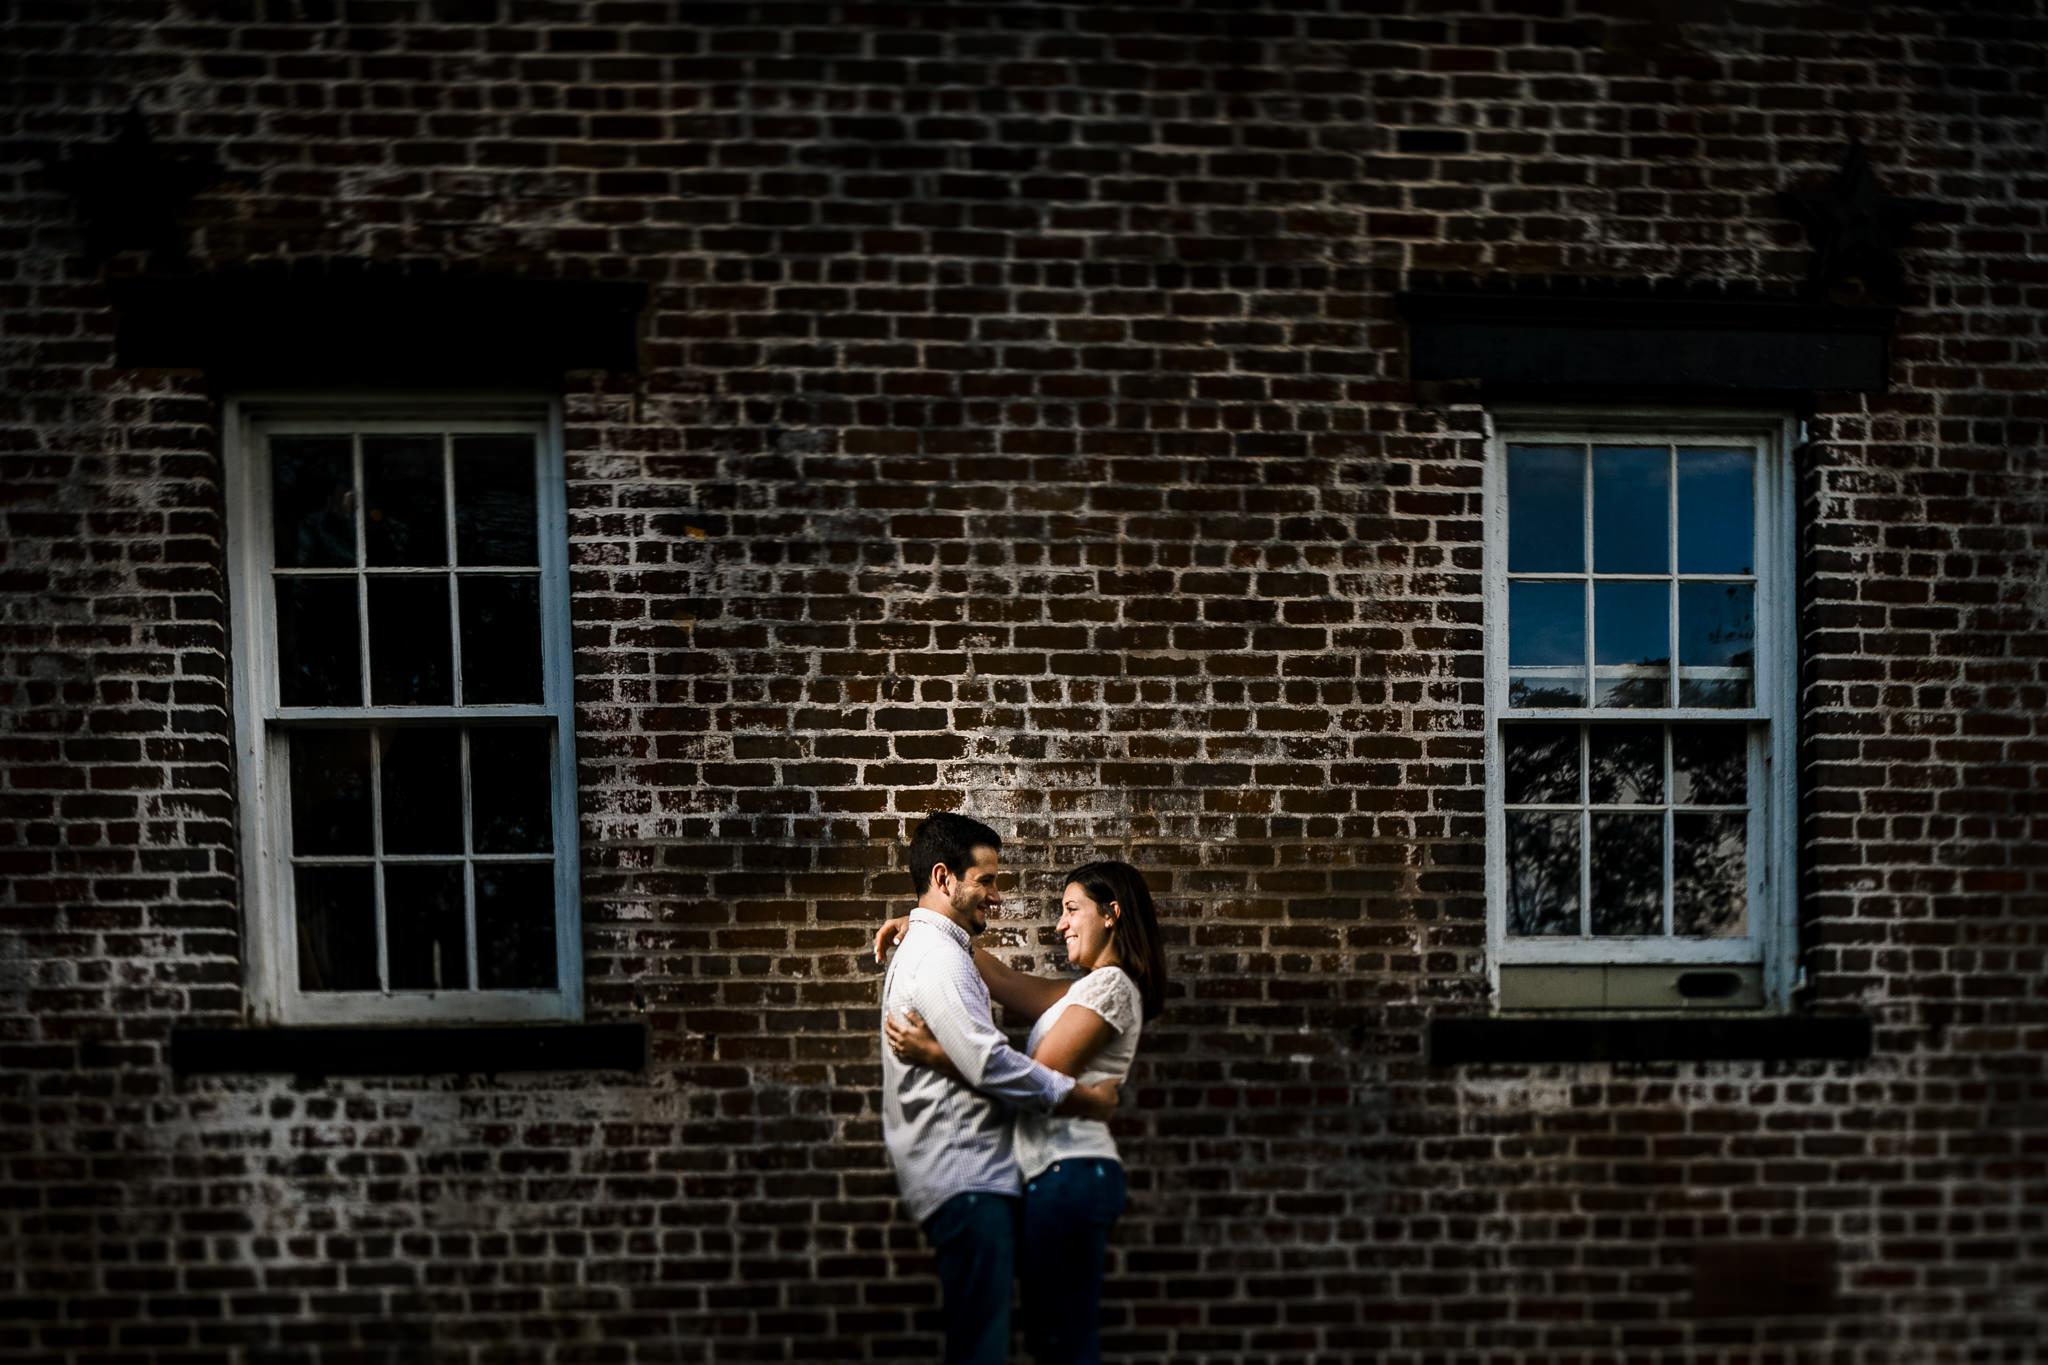 Gilbert-Allaire-State-Park-NJ-Engagement-Photos-05.JPG